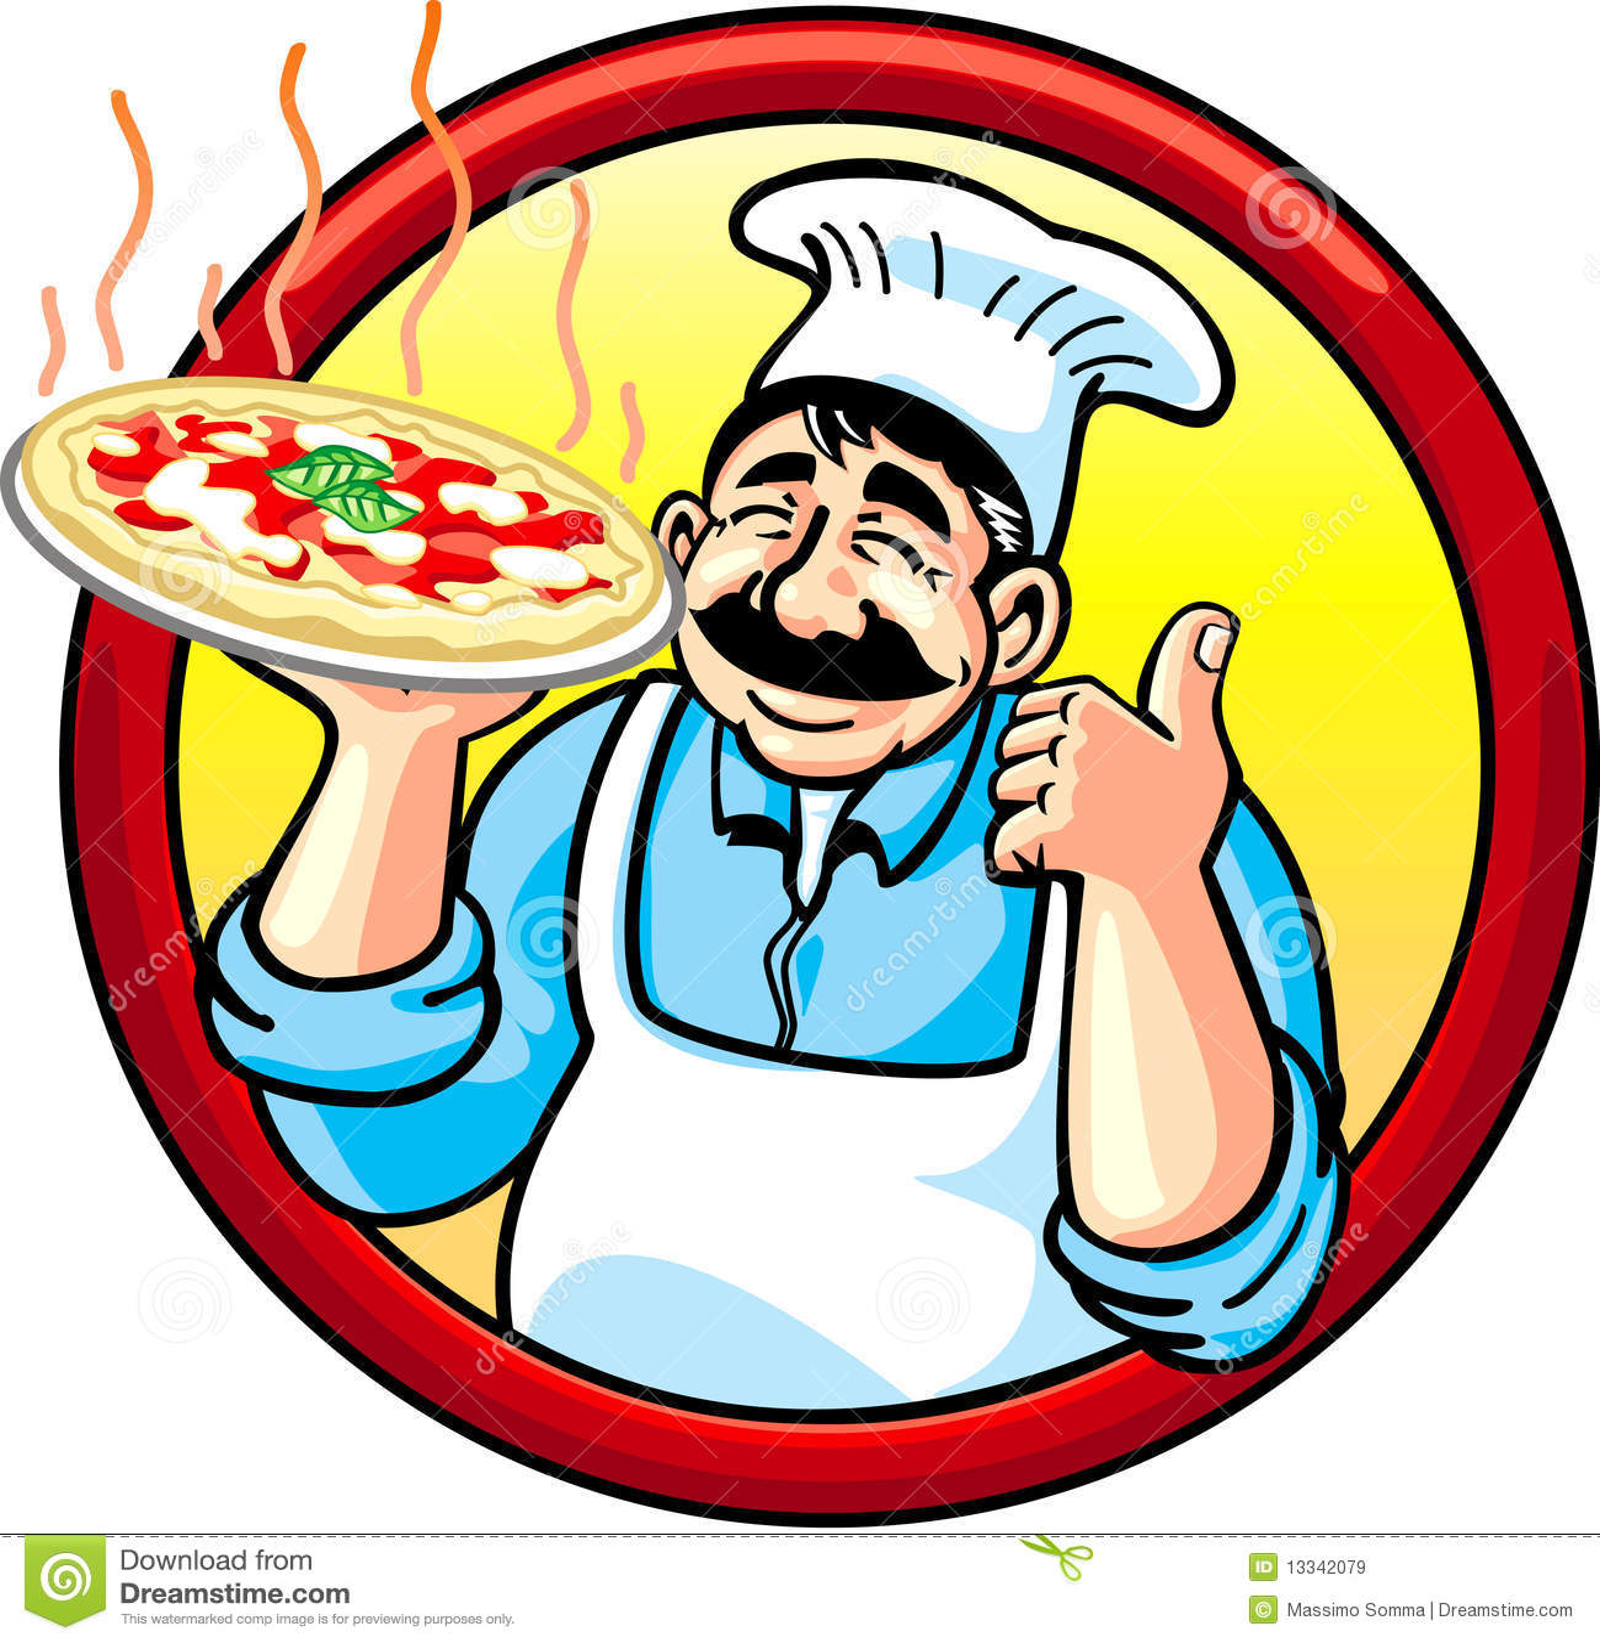 free clipart pizza man - photo #32